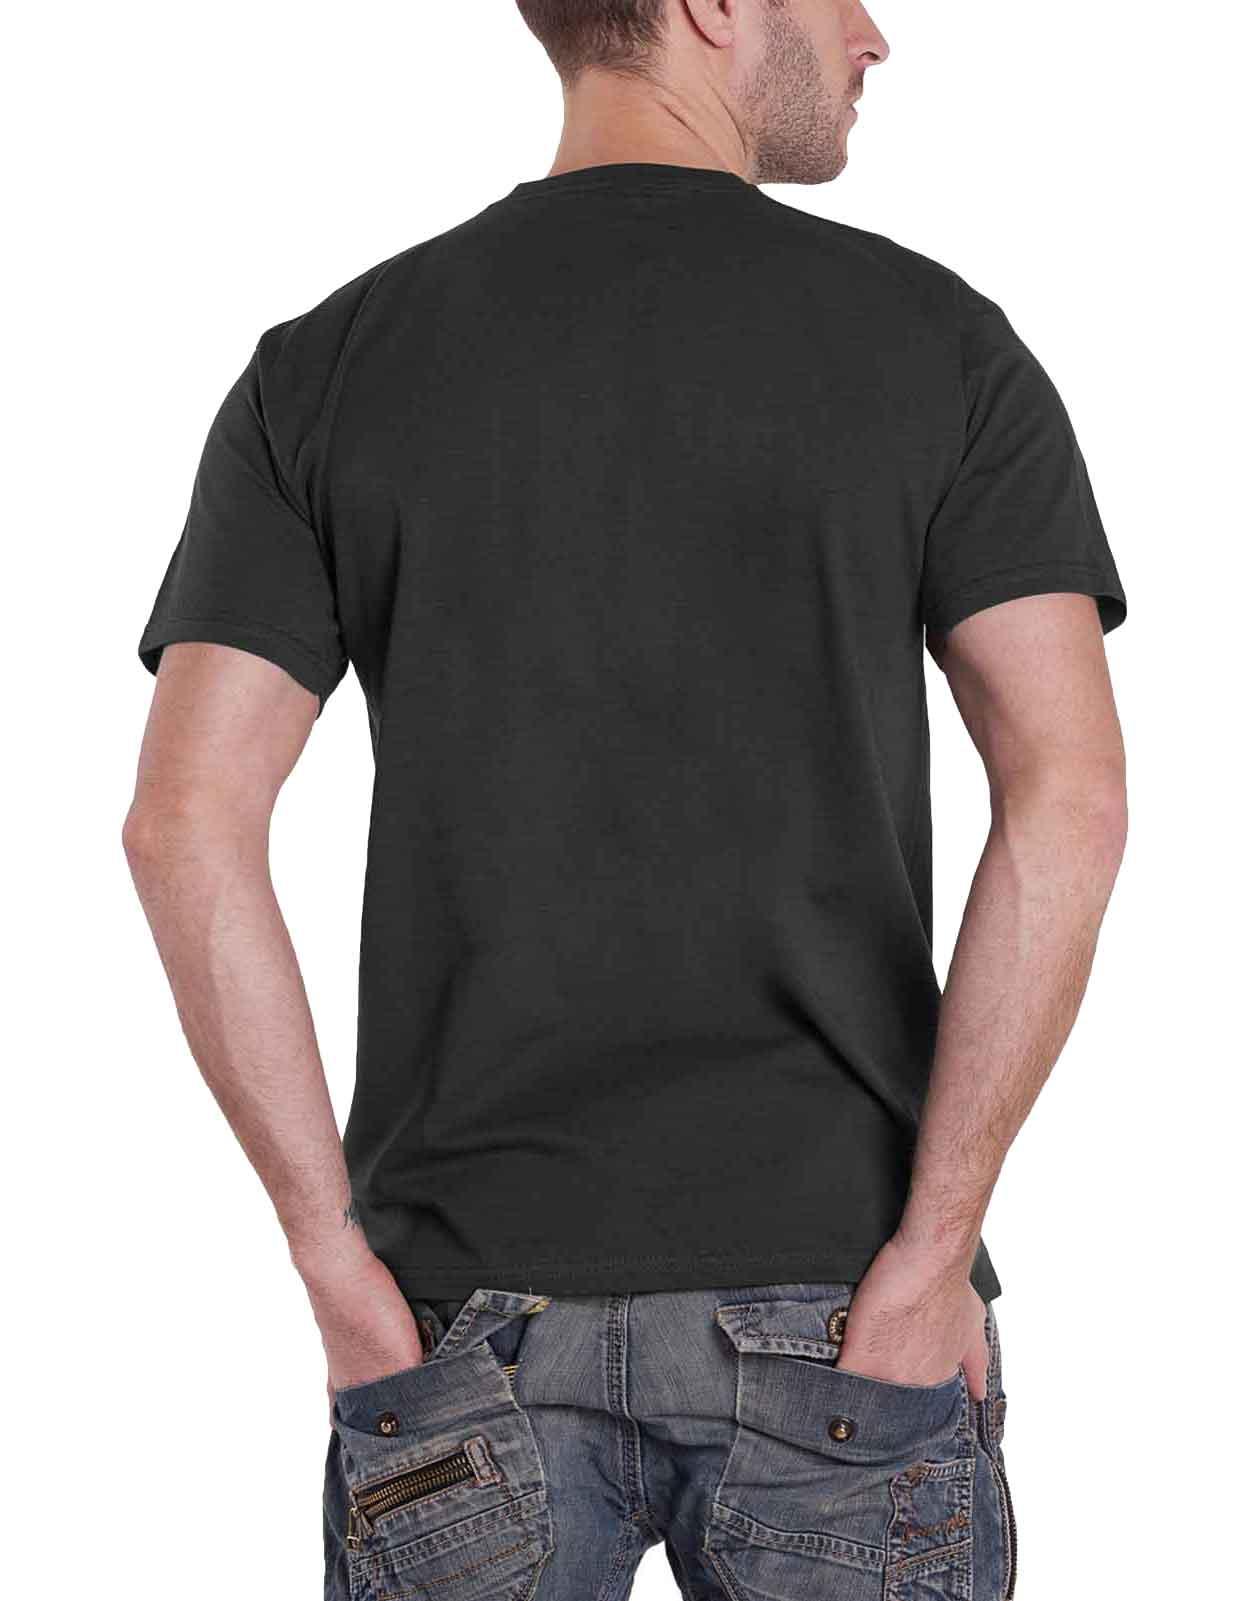 Officiel-Hawkwind-T-Shirt-Warrior-on-the-Edge-Space-Ritual-Doremi-homme-nouveau miniature 7